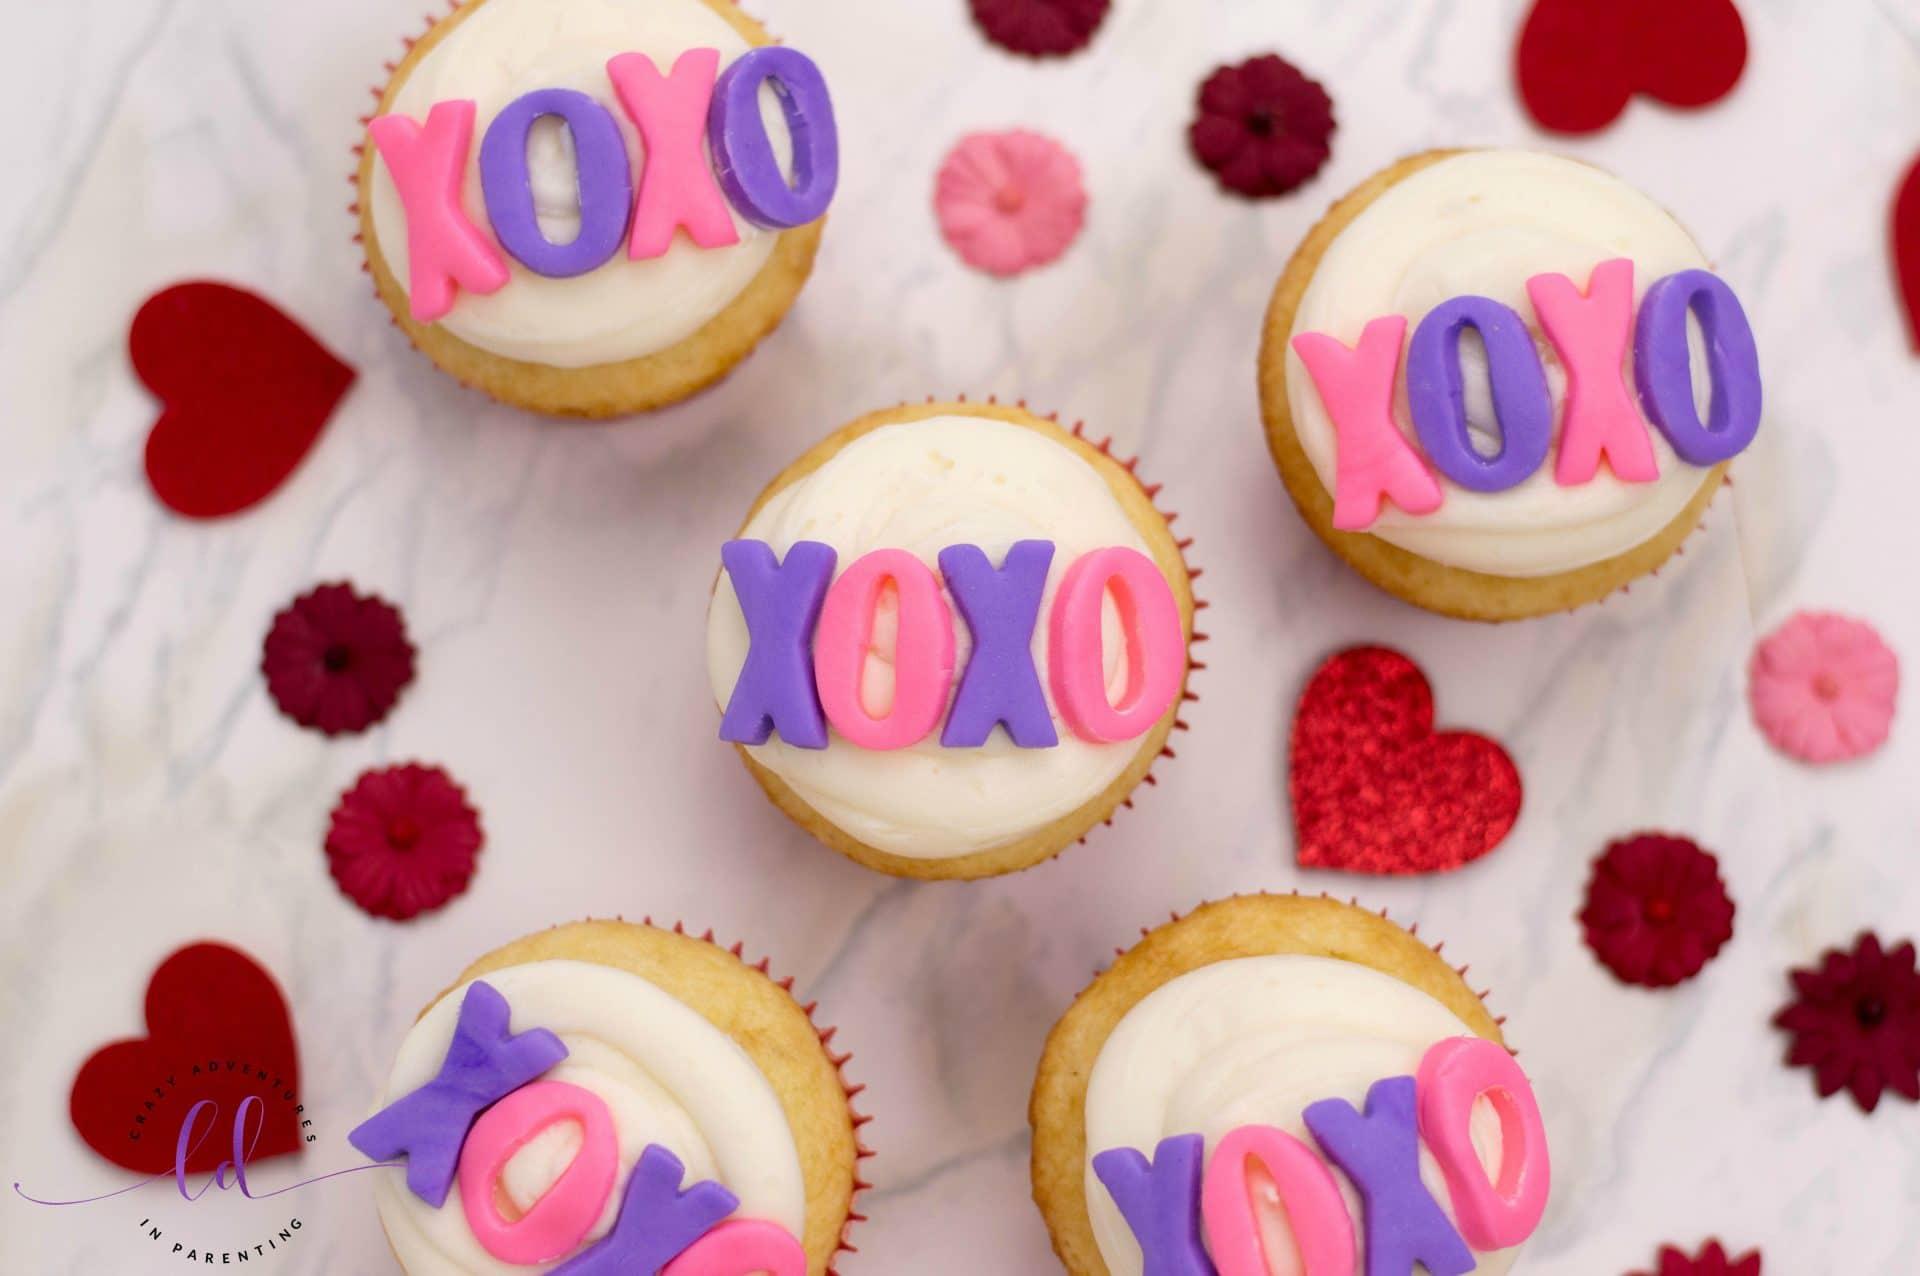 Fun XOXO Valentine's Cupcakes